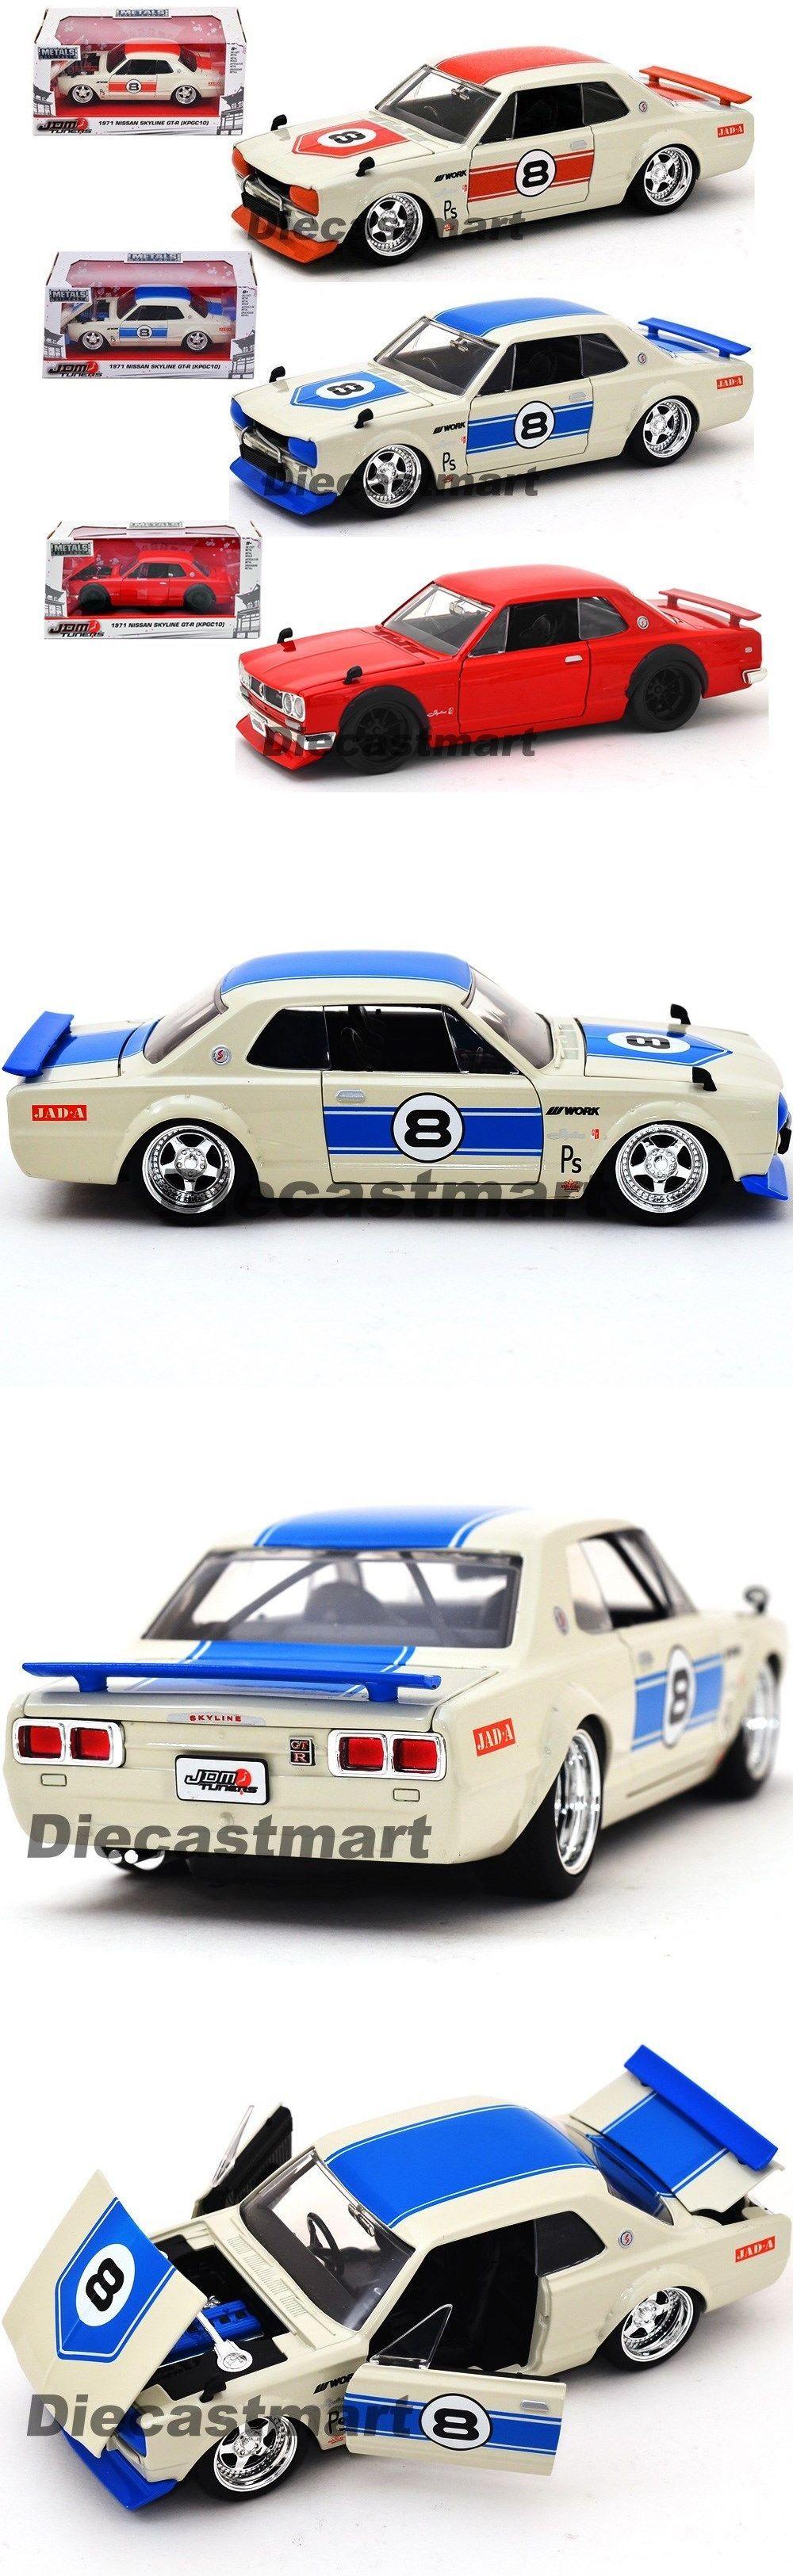 Jada car toys  Jada jdm tuners   nissan skyline gtr kpgc diecast model